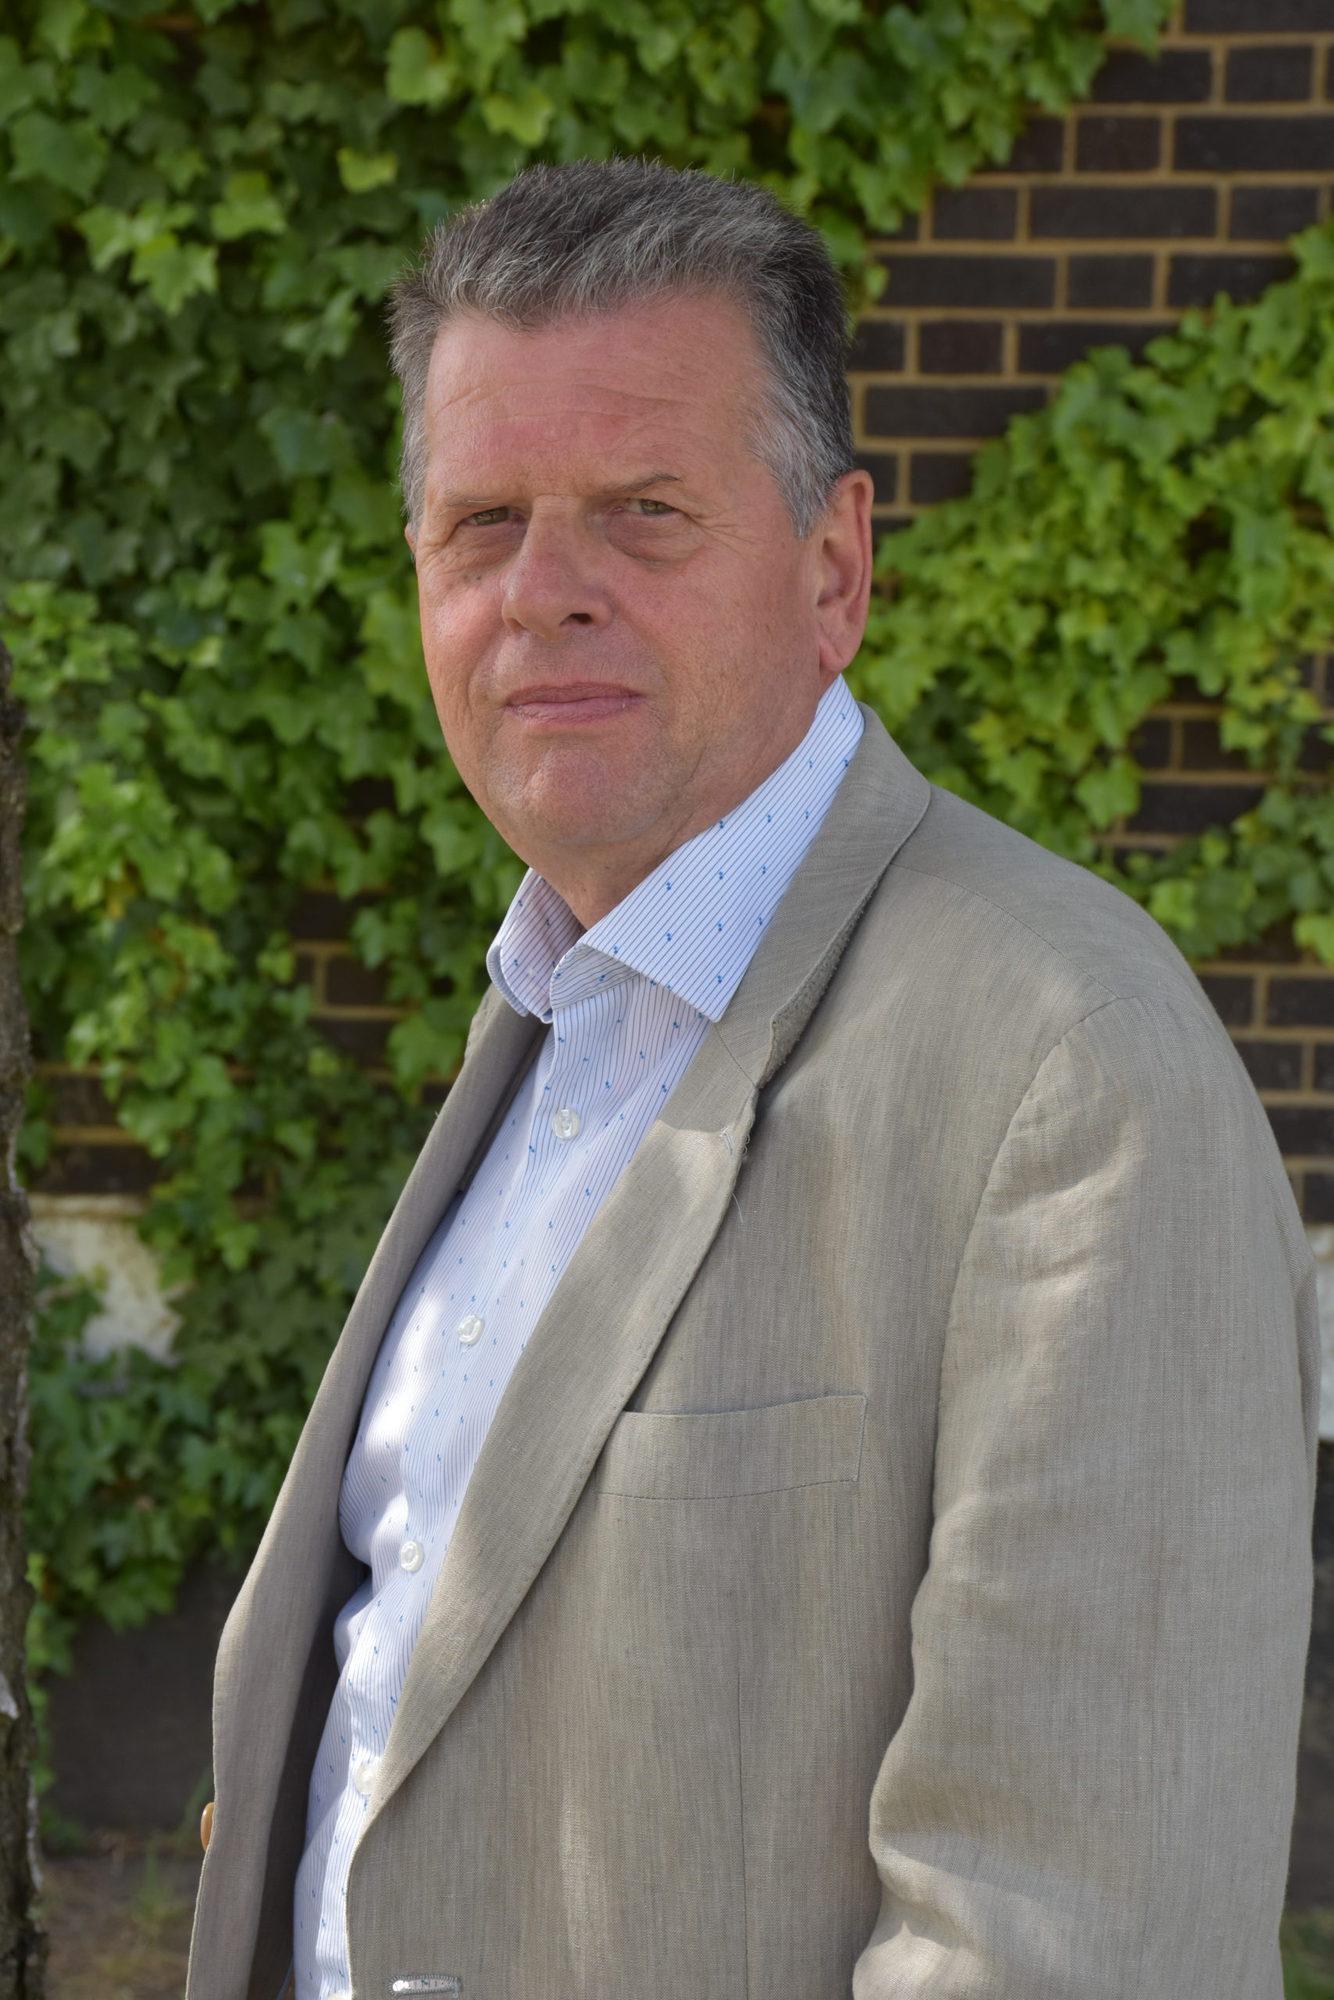 Alan Debenham – Chair People Committee